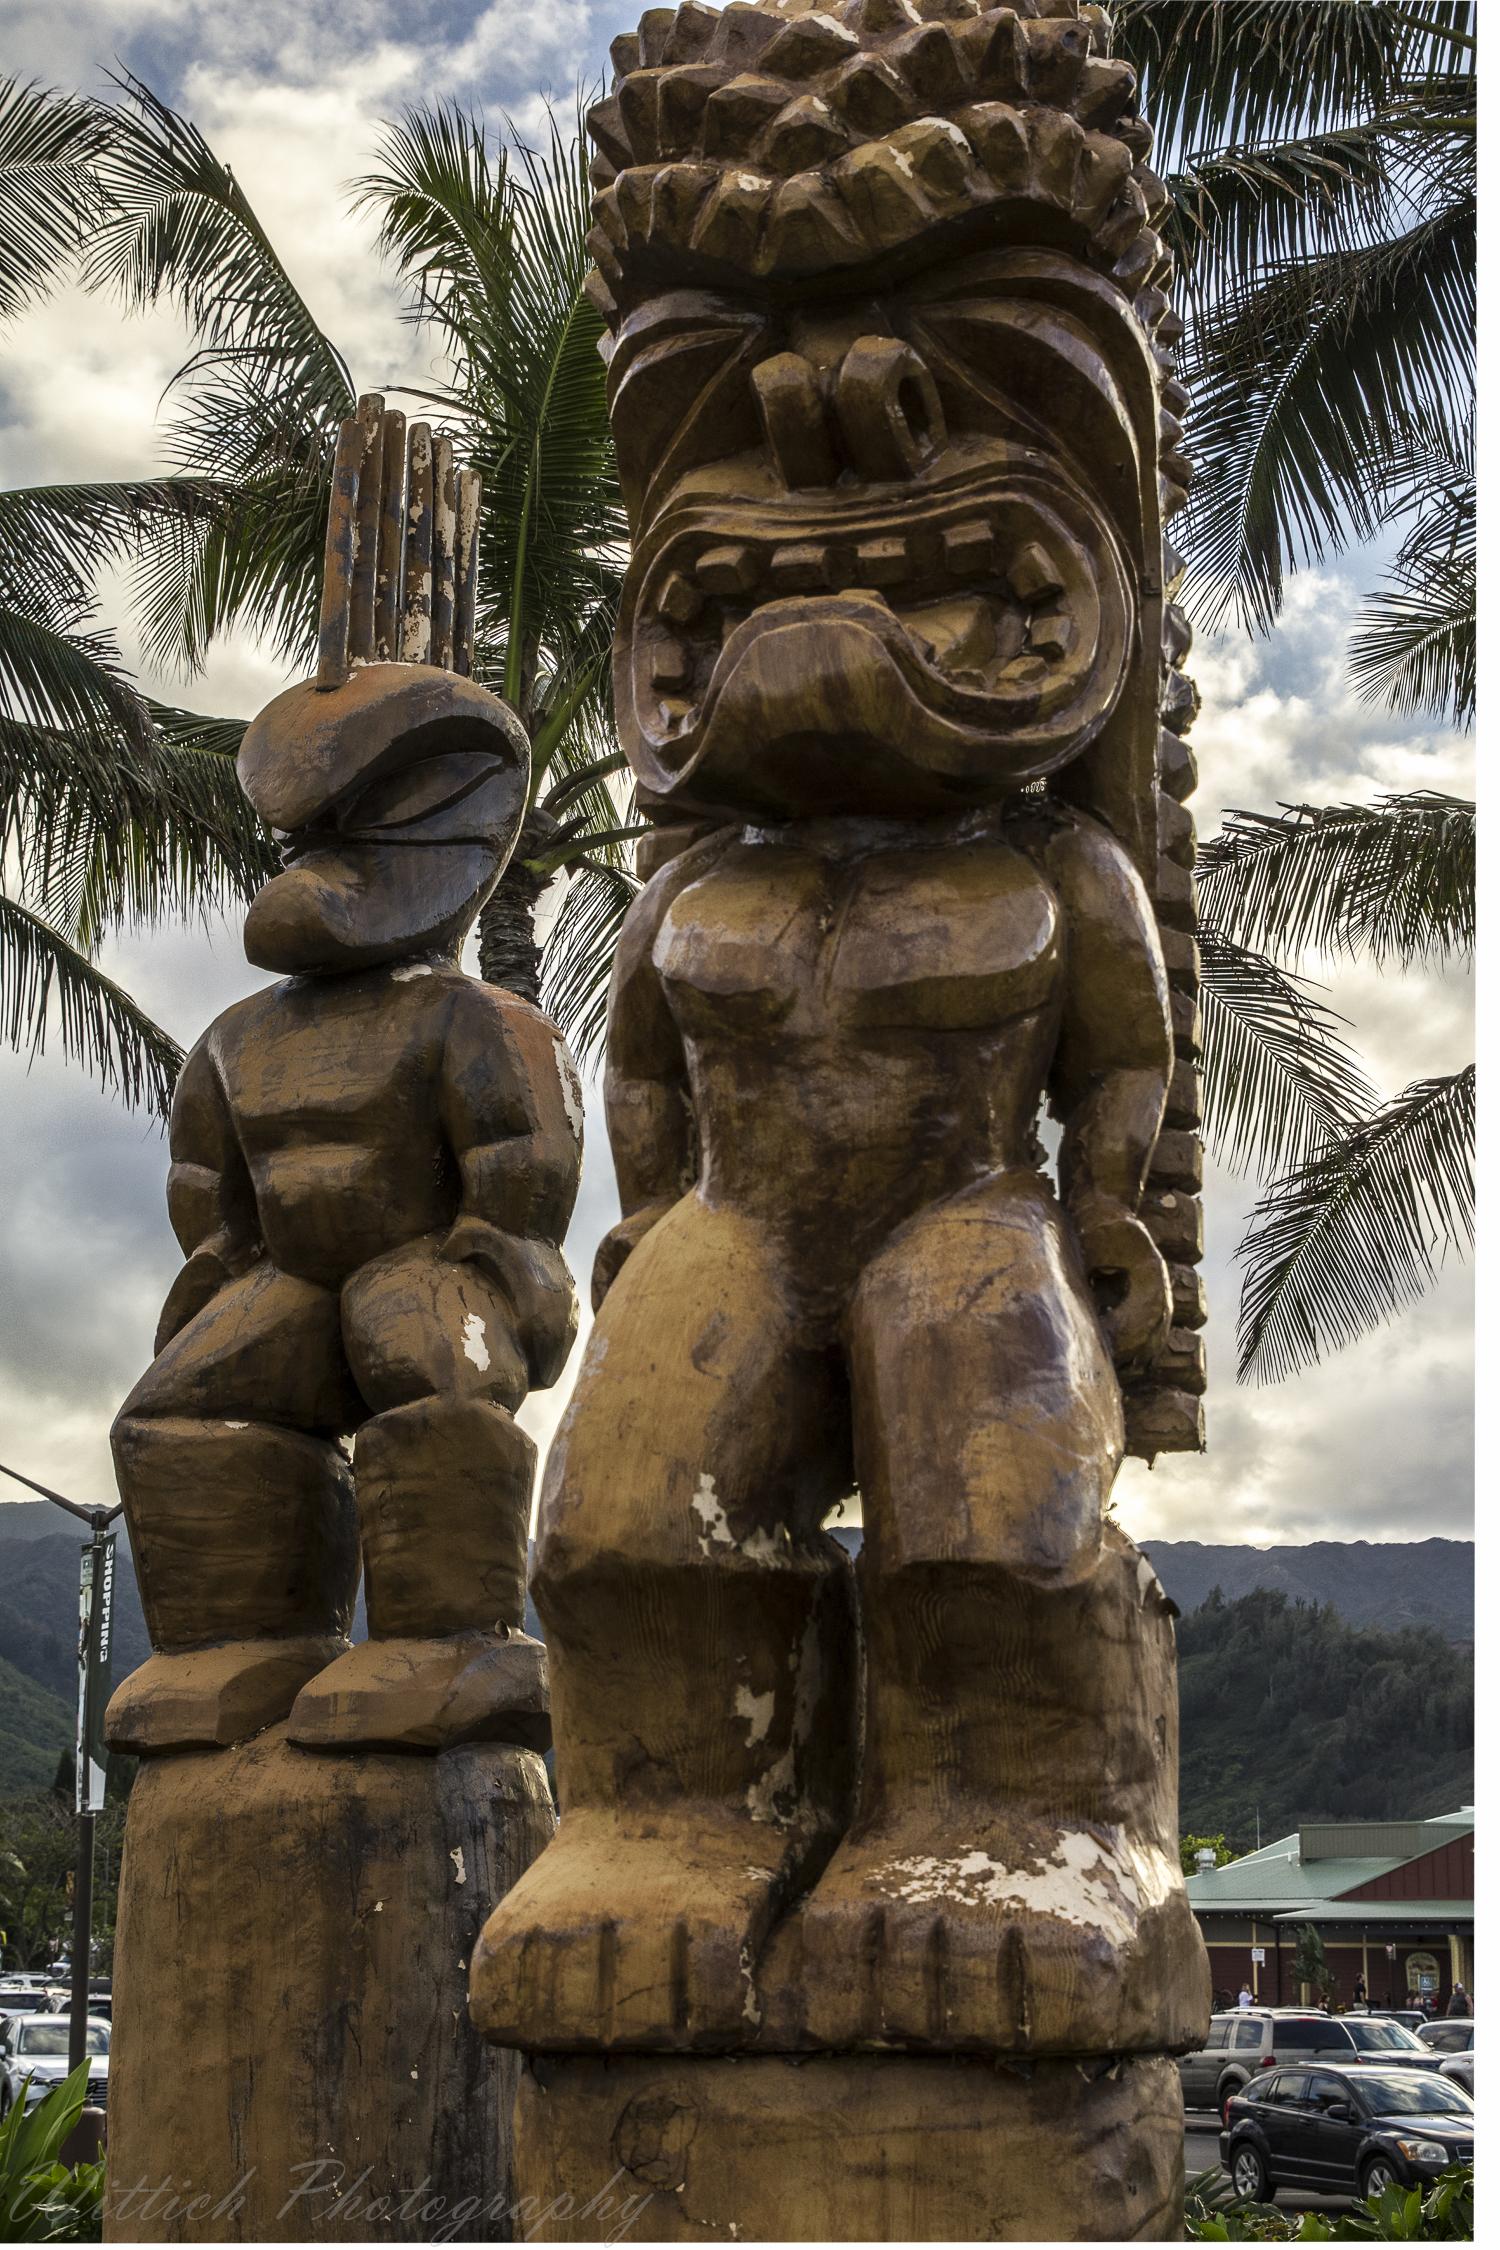 20180129-hawaii days 1-4_MG_1802-HDR.jpg